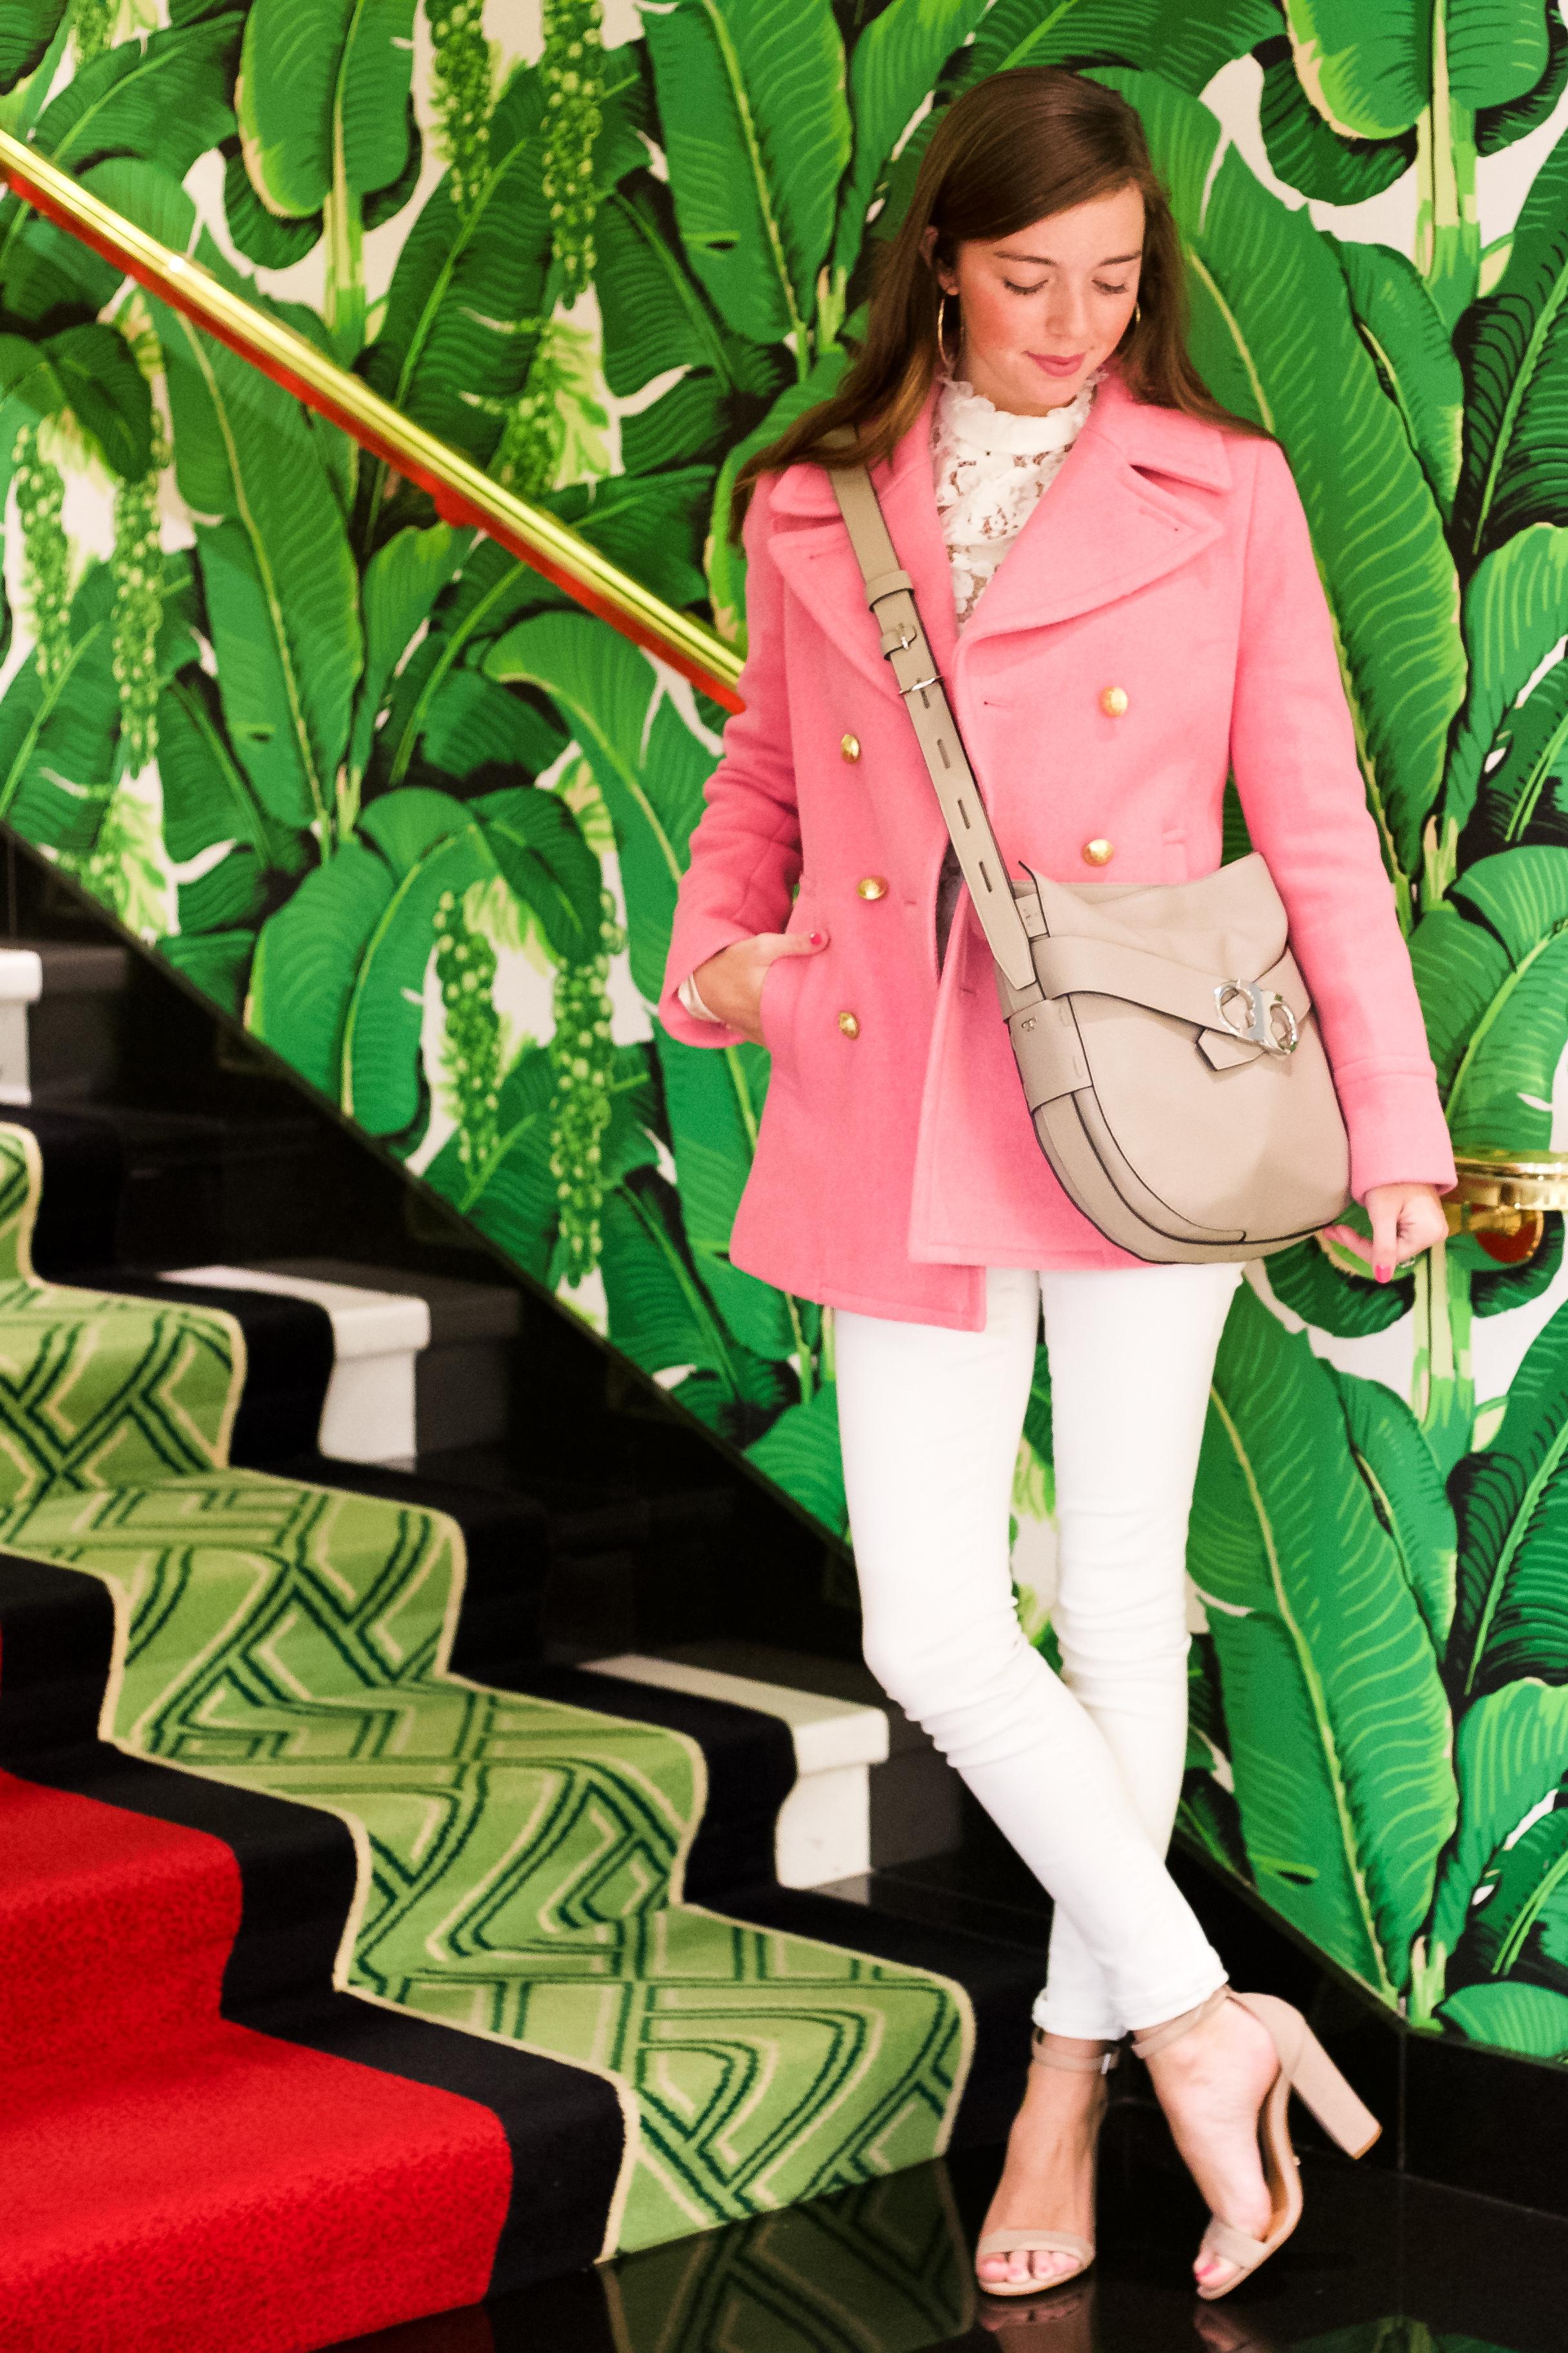 fashion blogger lcb style greenbrier tory burch j. crew (11 of 14).jpg